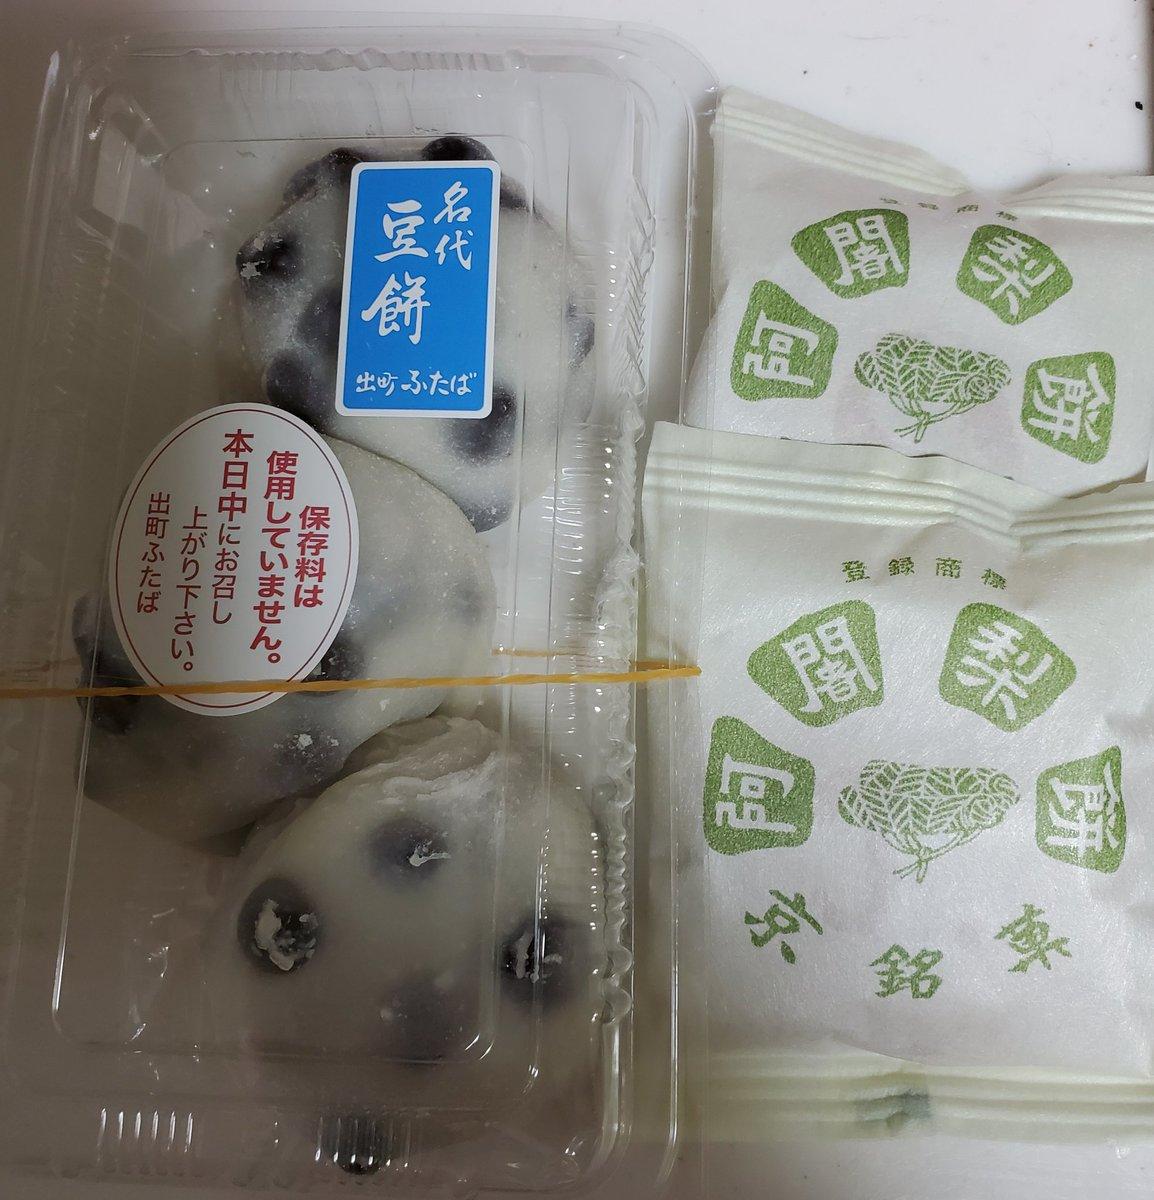 test ツイッターメディア - うひひひひひひひひひひひひひひひ ( ´థ౪థ)ウヒッ  やっと買えた「阿闍梨餅」と、京都の出町ふたばの豆餅♥  どんだけ食うねん!というのは「聞こえません」(笑)  コレに赤福と信玄餅もあるんだもん https://t.co/b5dmpPfg8V